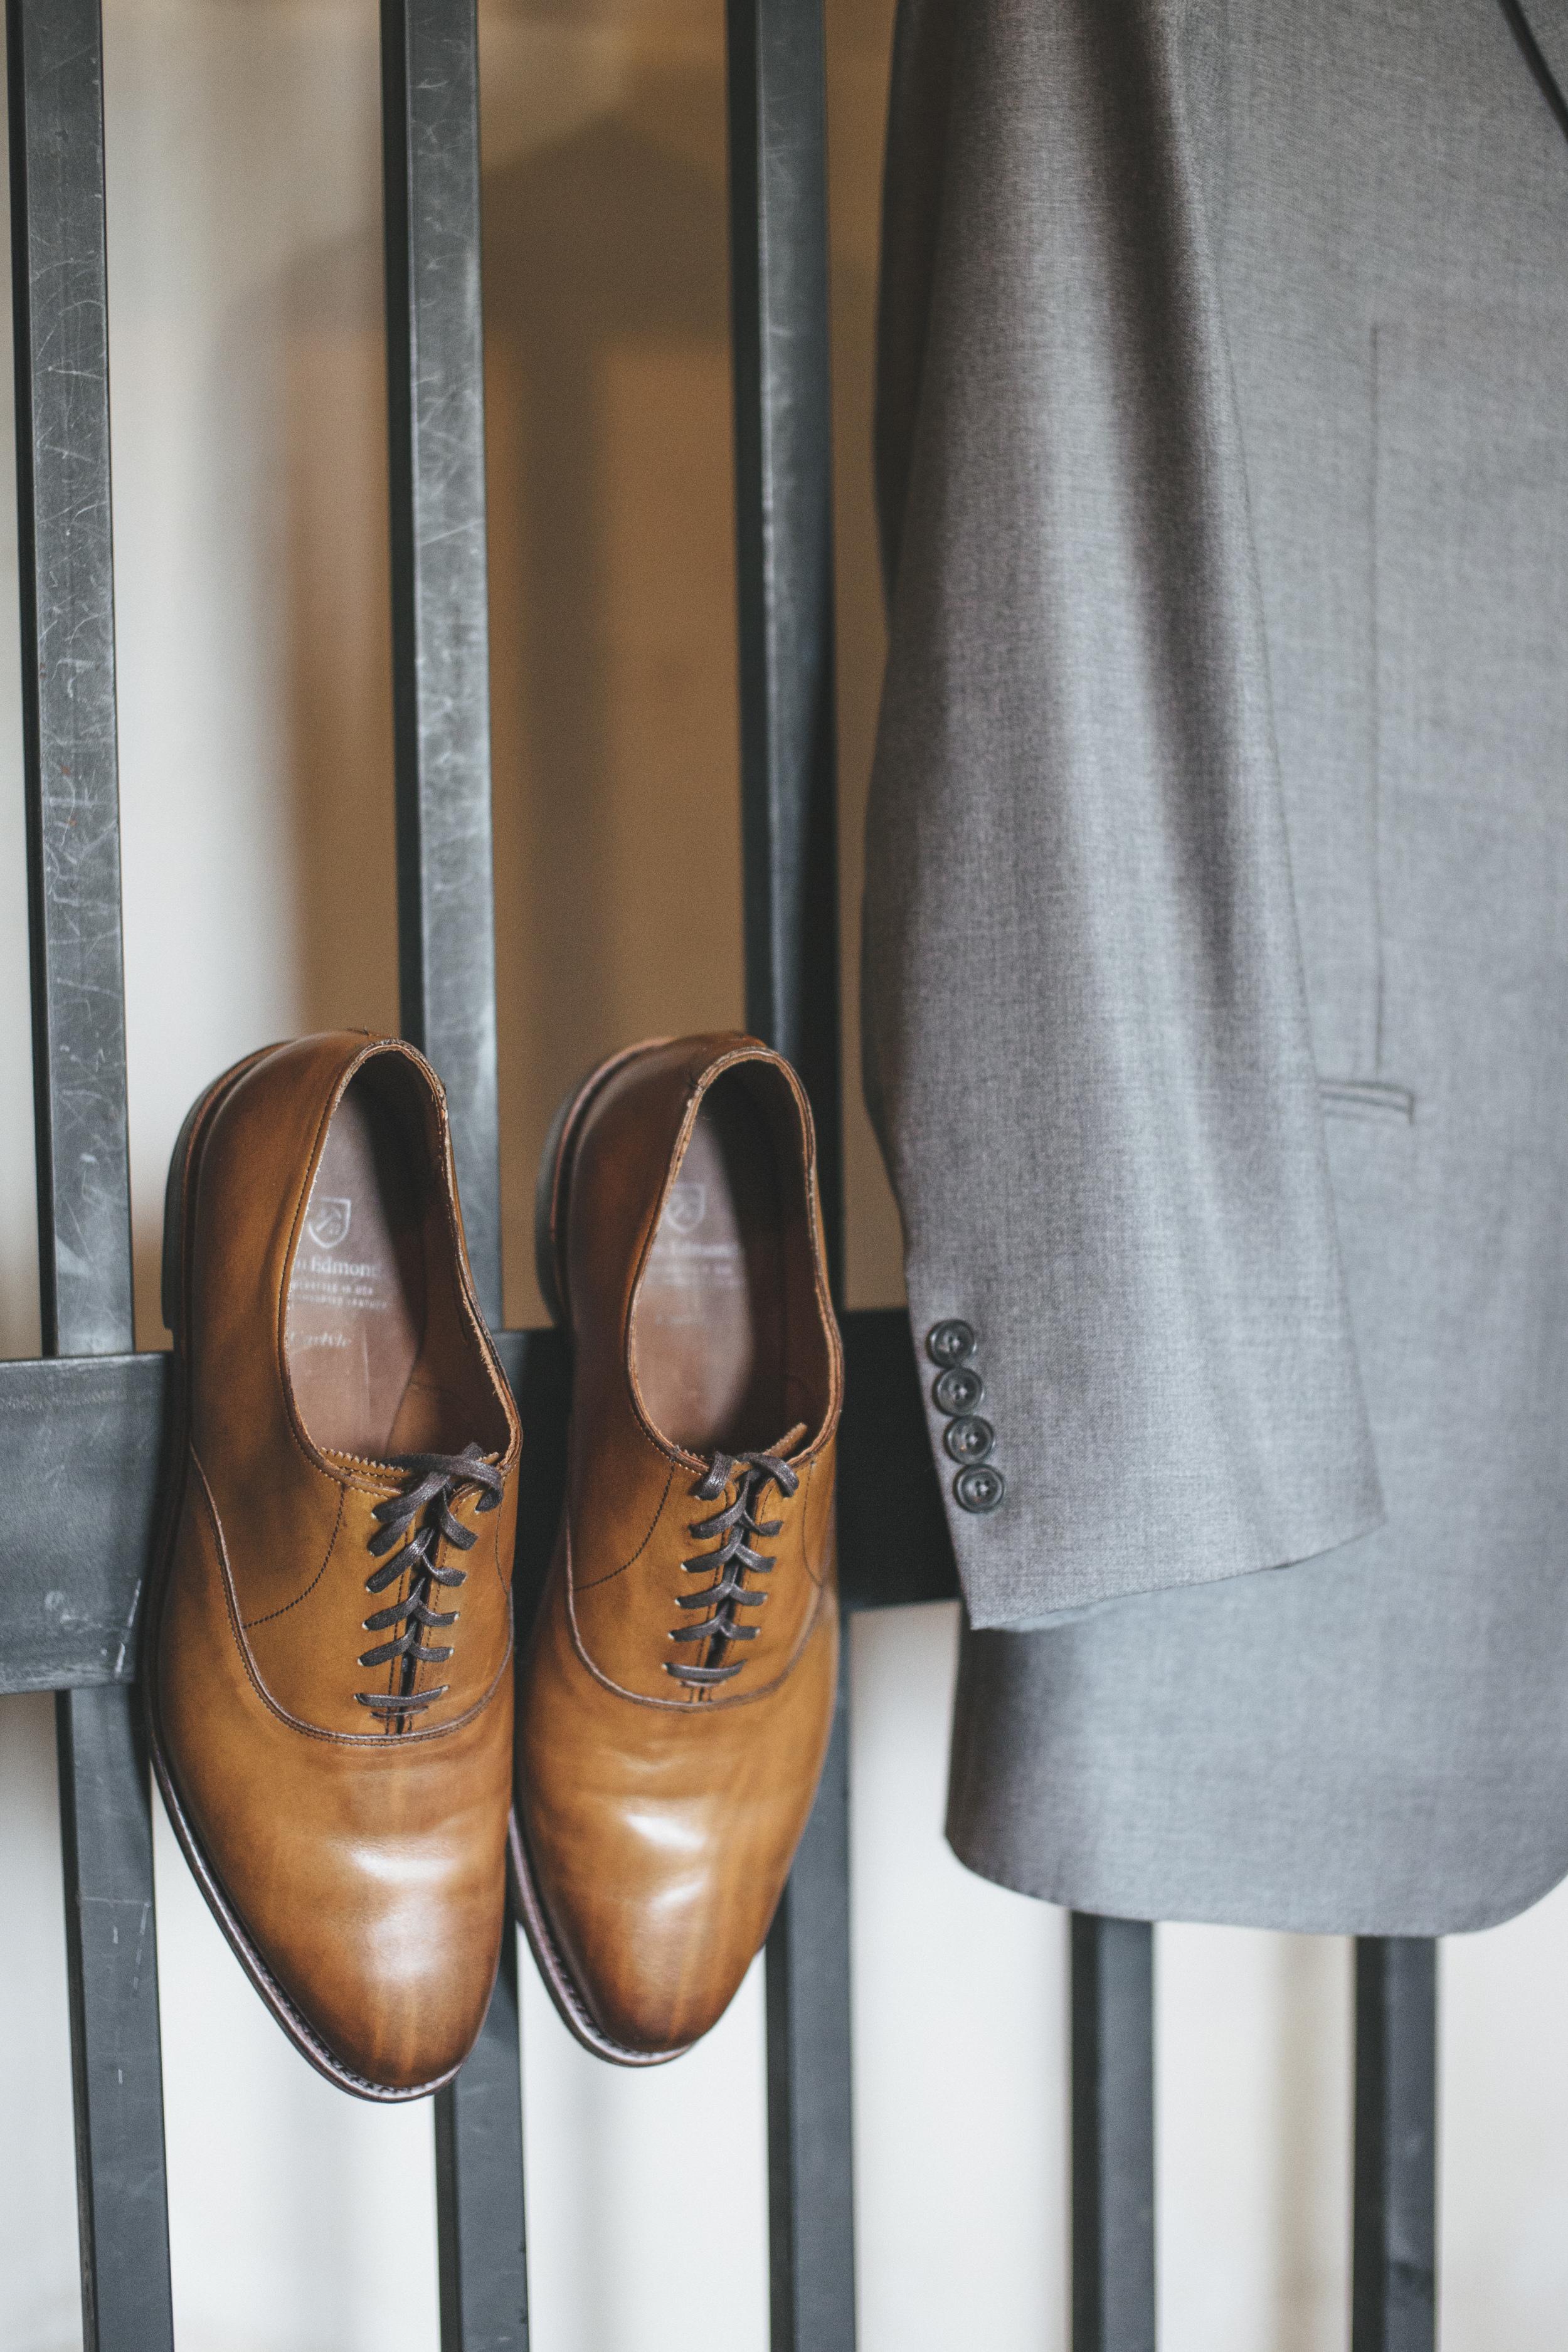 Grooms Wedding Shoes | Nice Men's Brown Shoes